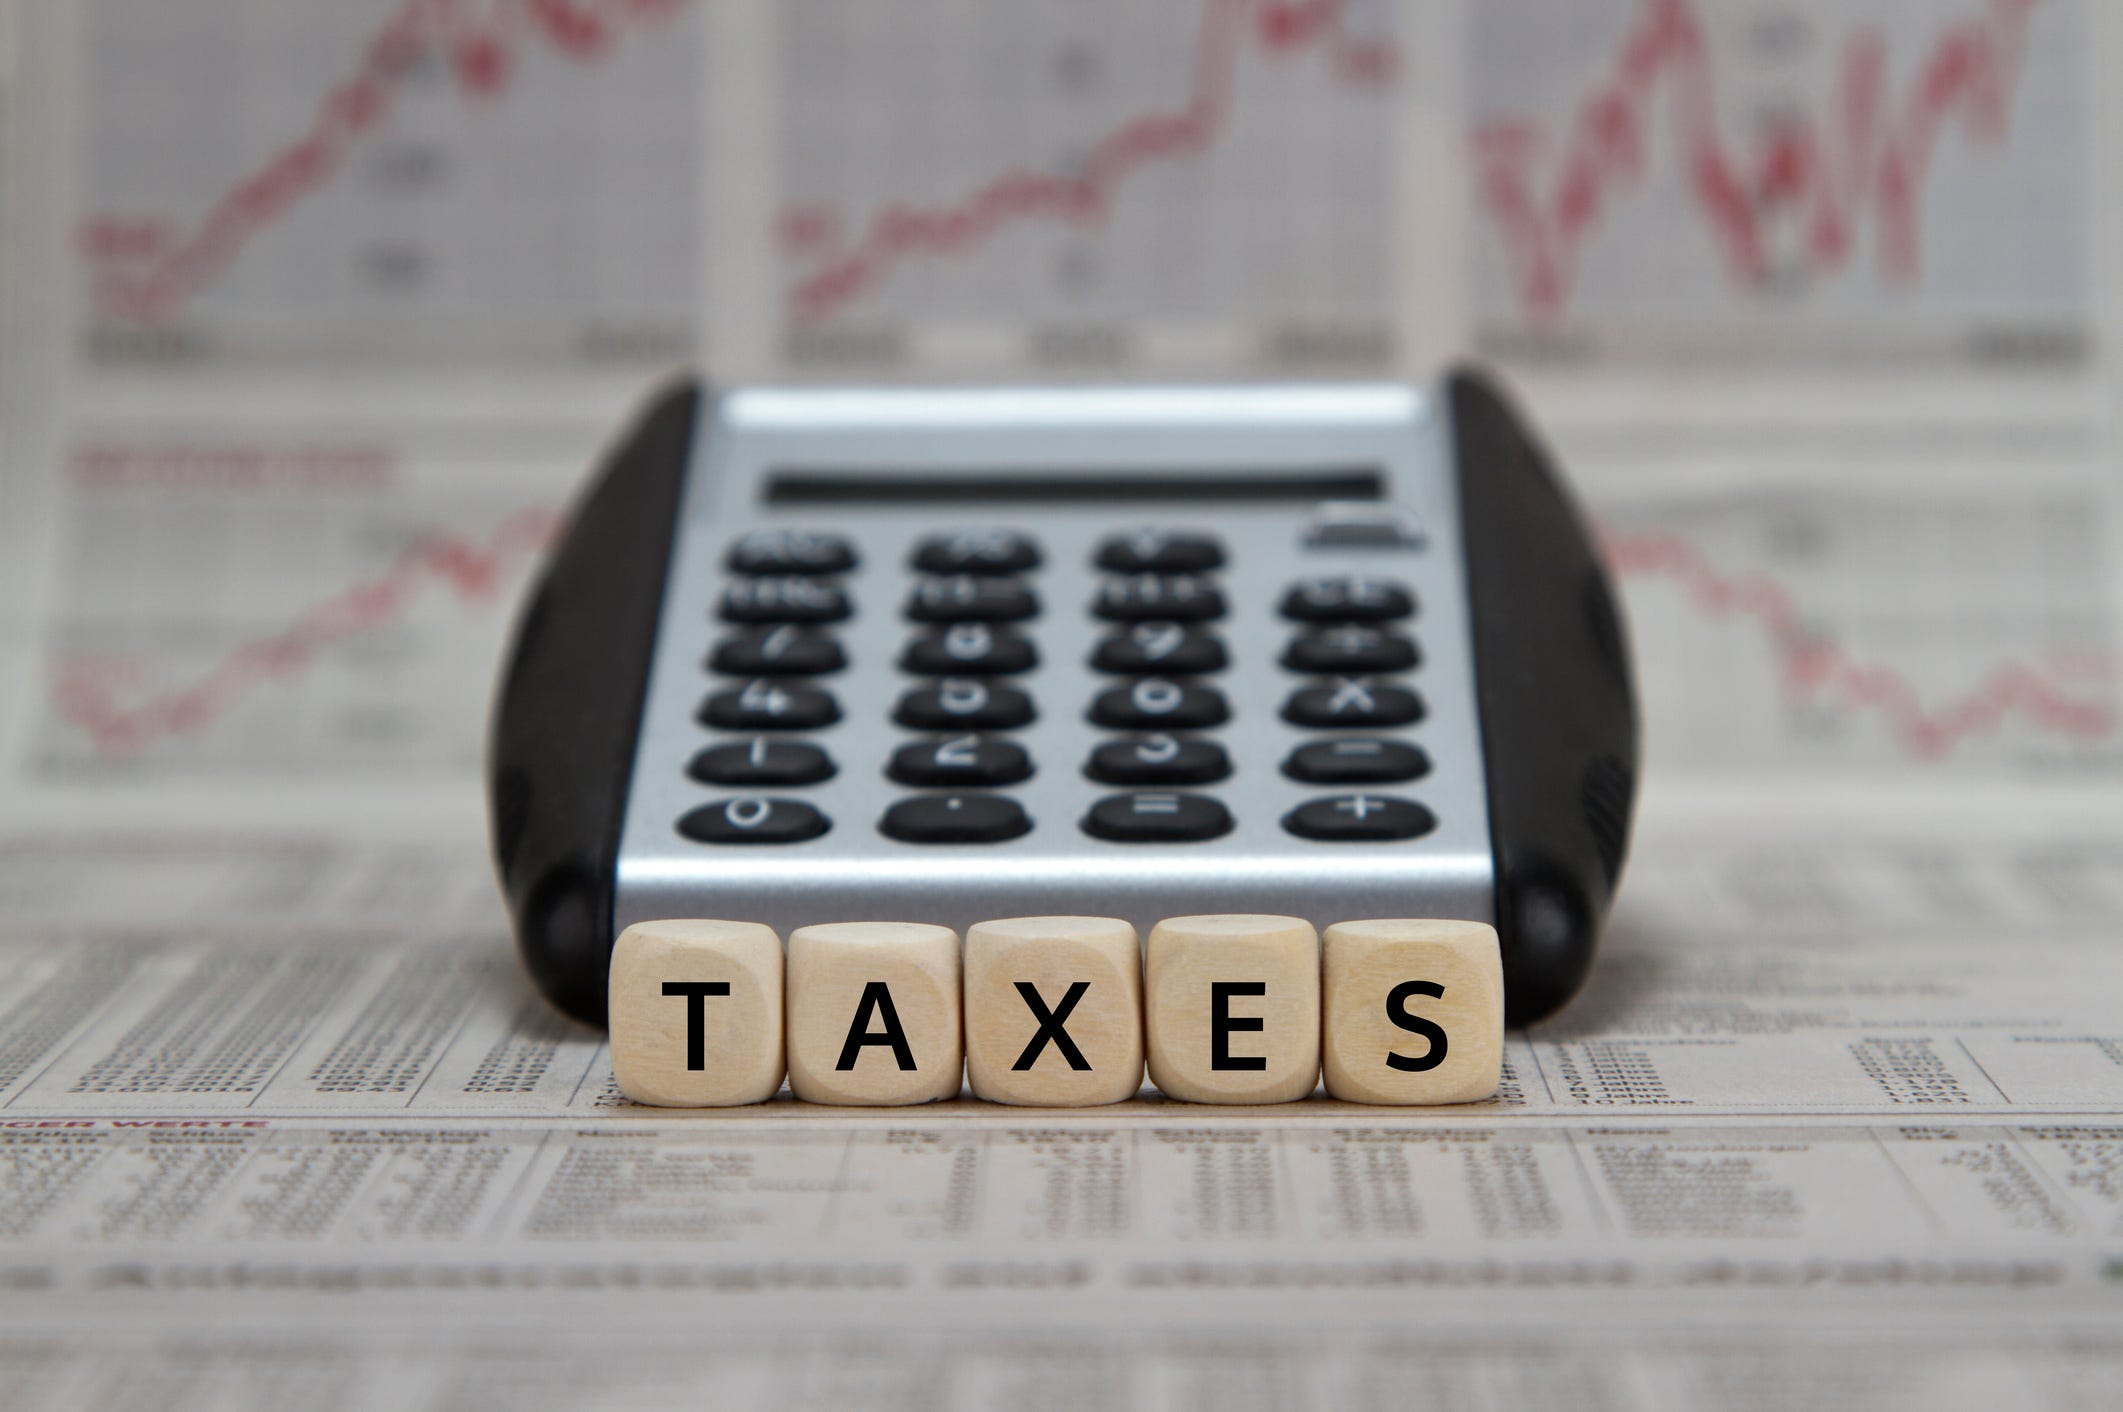 TurboTax, H&R Block, Jackson Hewitt: The best tax software for filing online